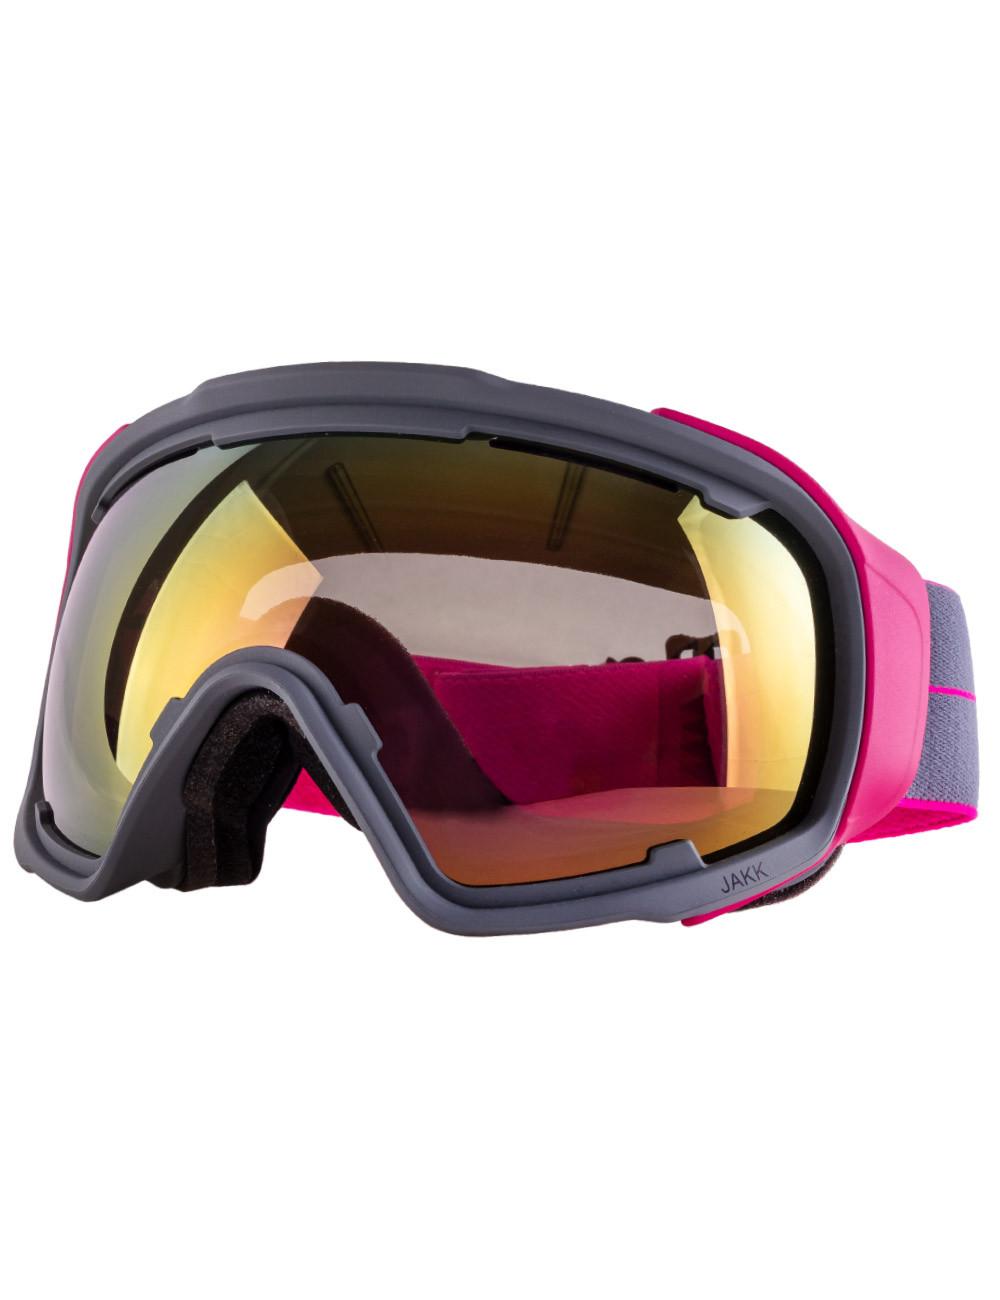 Gogle narciarskie Uvex Jakk Sphere